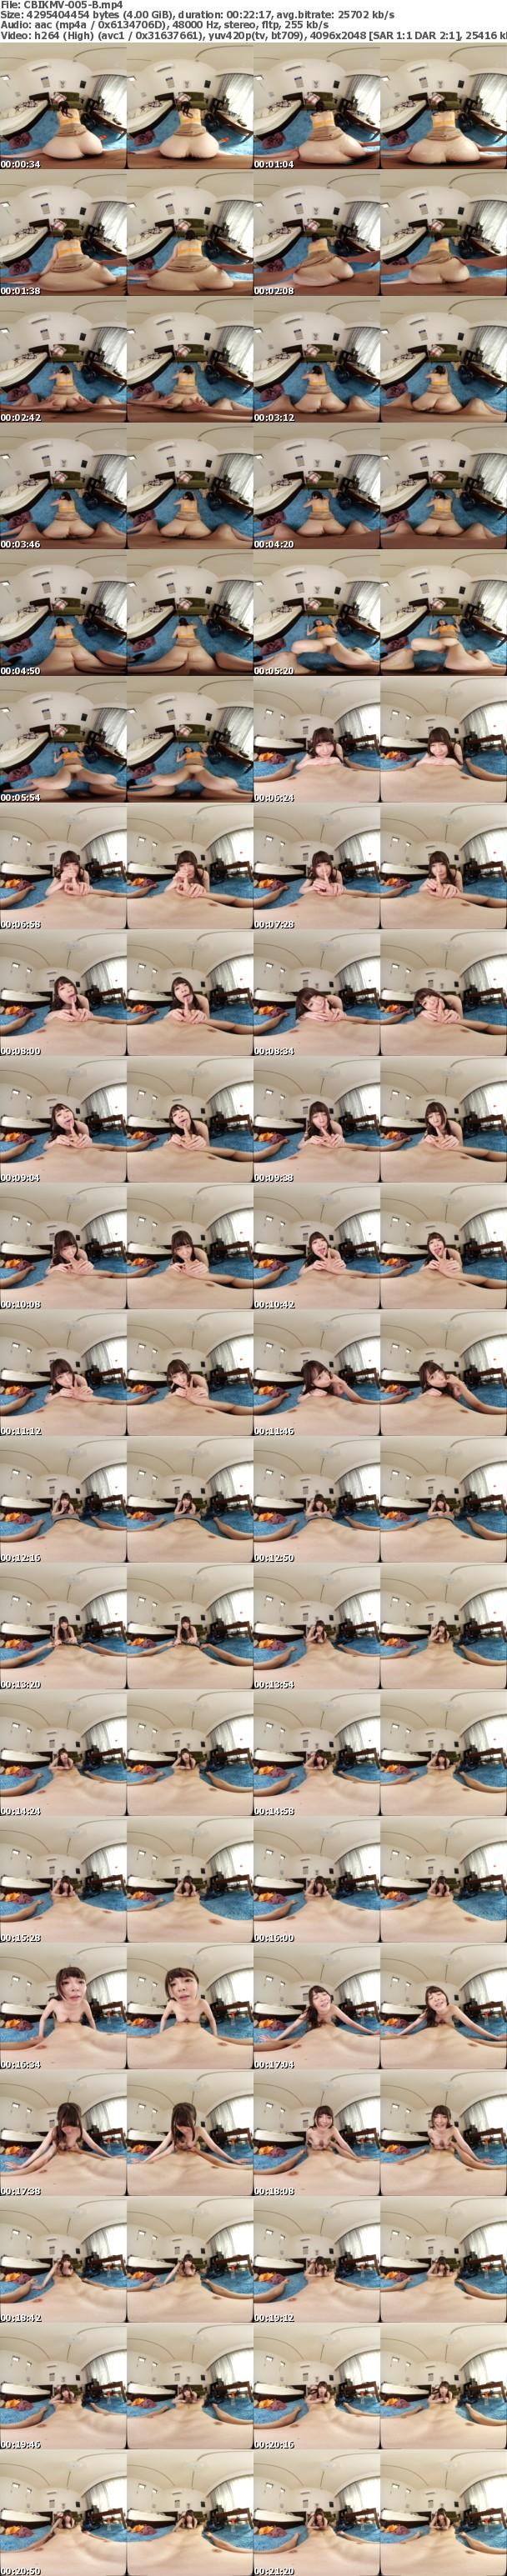 (VR) (LR) CBIKMV-005 絶倫ボディ 爆乳Gカップ嬢のぐちょ濡れ生ま○こに即ハメで追撃アクメっで生ち○ぽ堕ち 排卵日にどっぷり種付け貪り性交 三船かれん